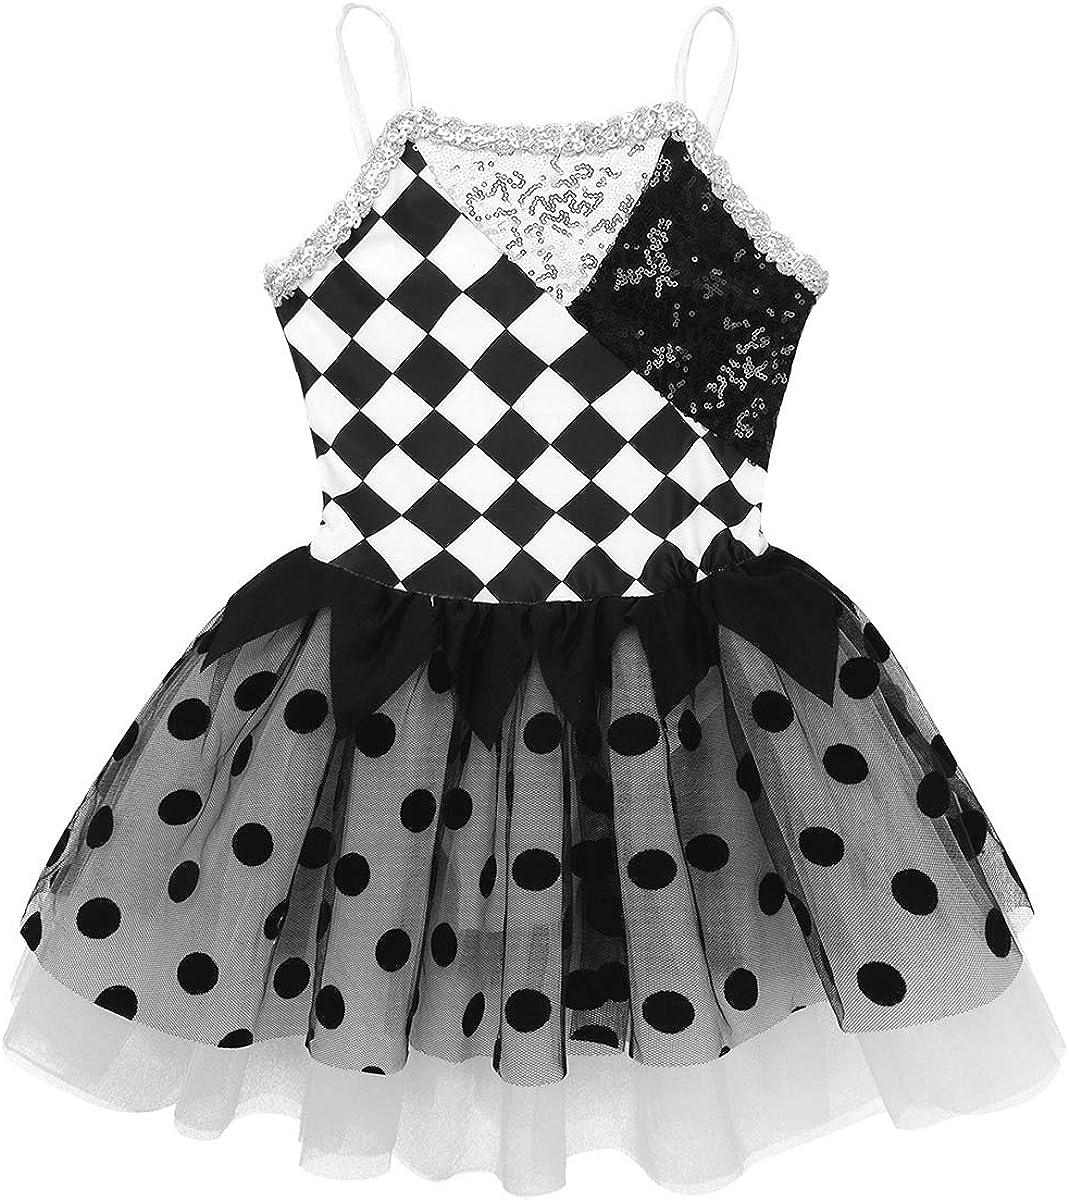 Kaerm Girls Kids Ringmaster Circus Costume Sequins Texudo Leotard Tutu Skirts Ballet Dance Dress